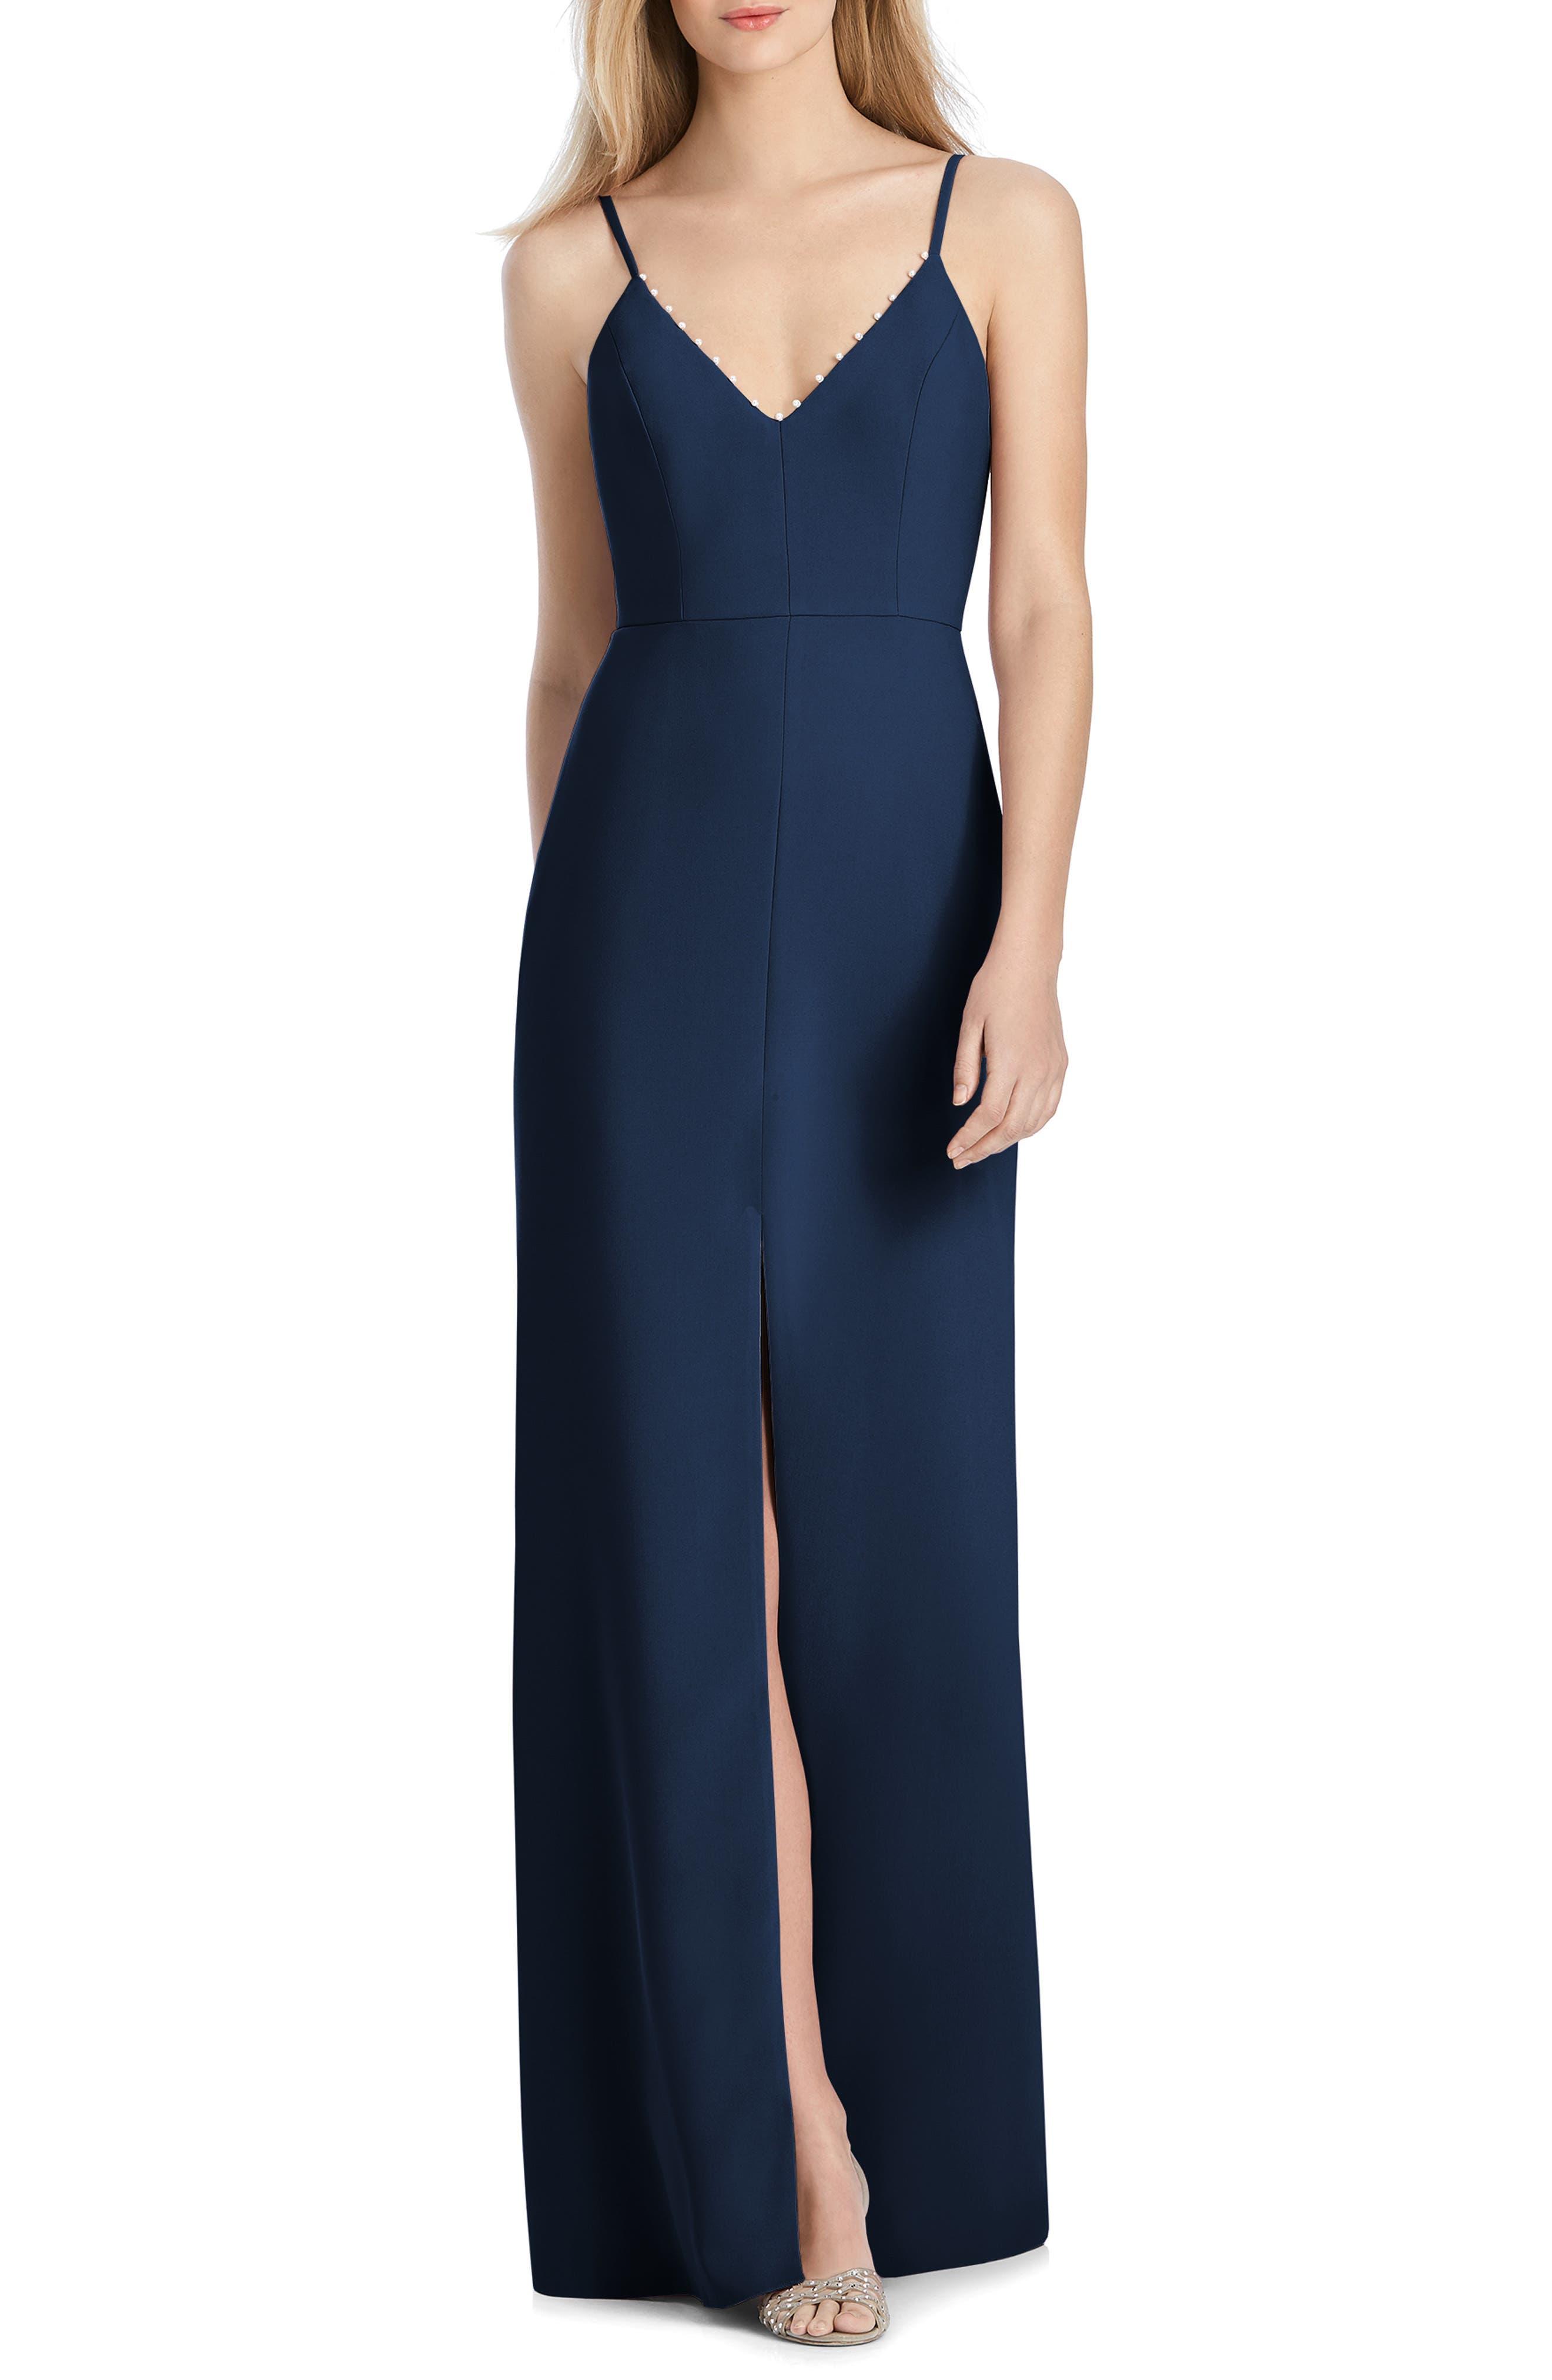 Lela Rose Bridesmaid V-Neck Crepe Mermaid Gown, Blue